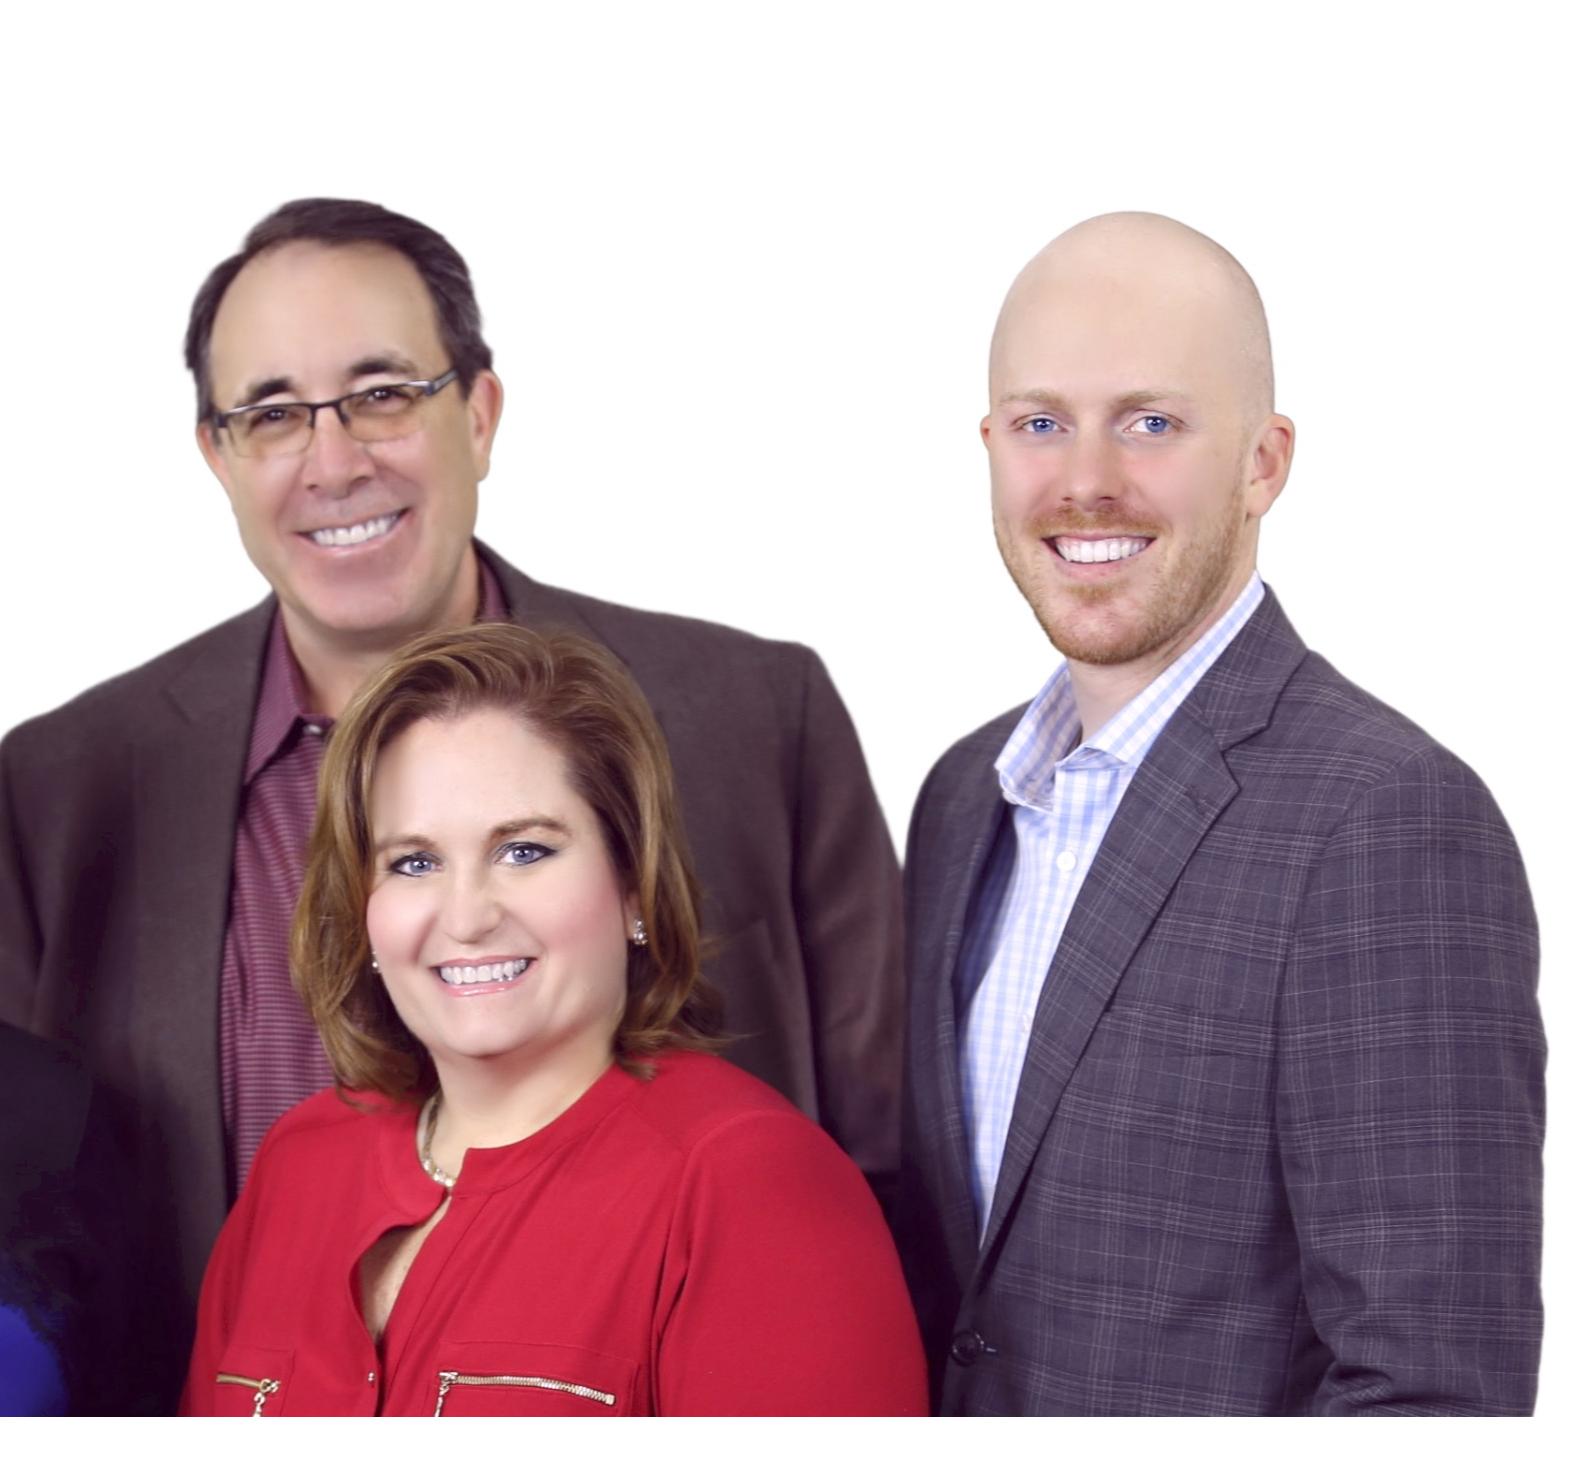 Keller Williams Your Advantage Team Omaha Real Estate Agents Top Realtor Team image 3